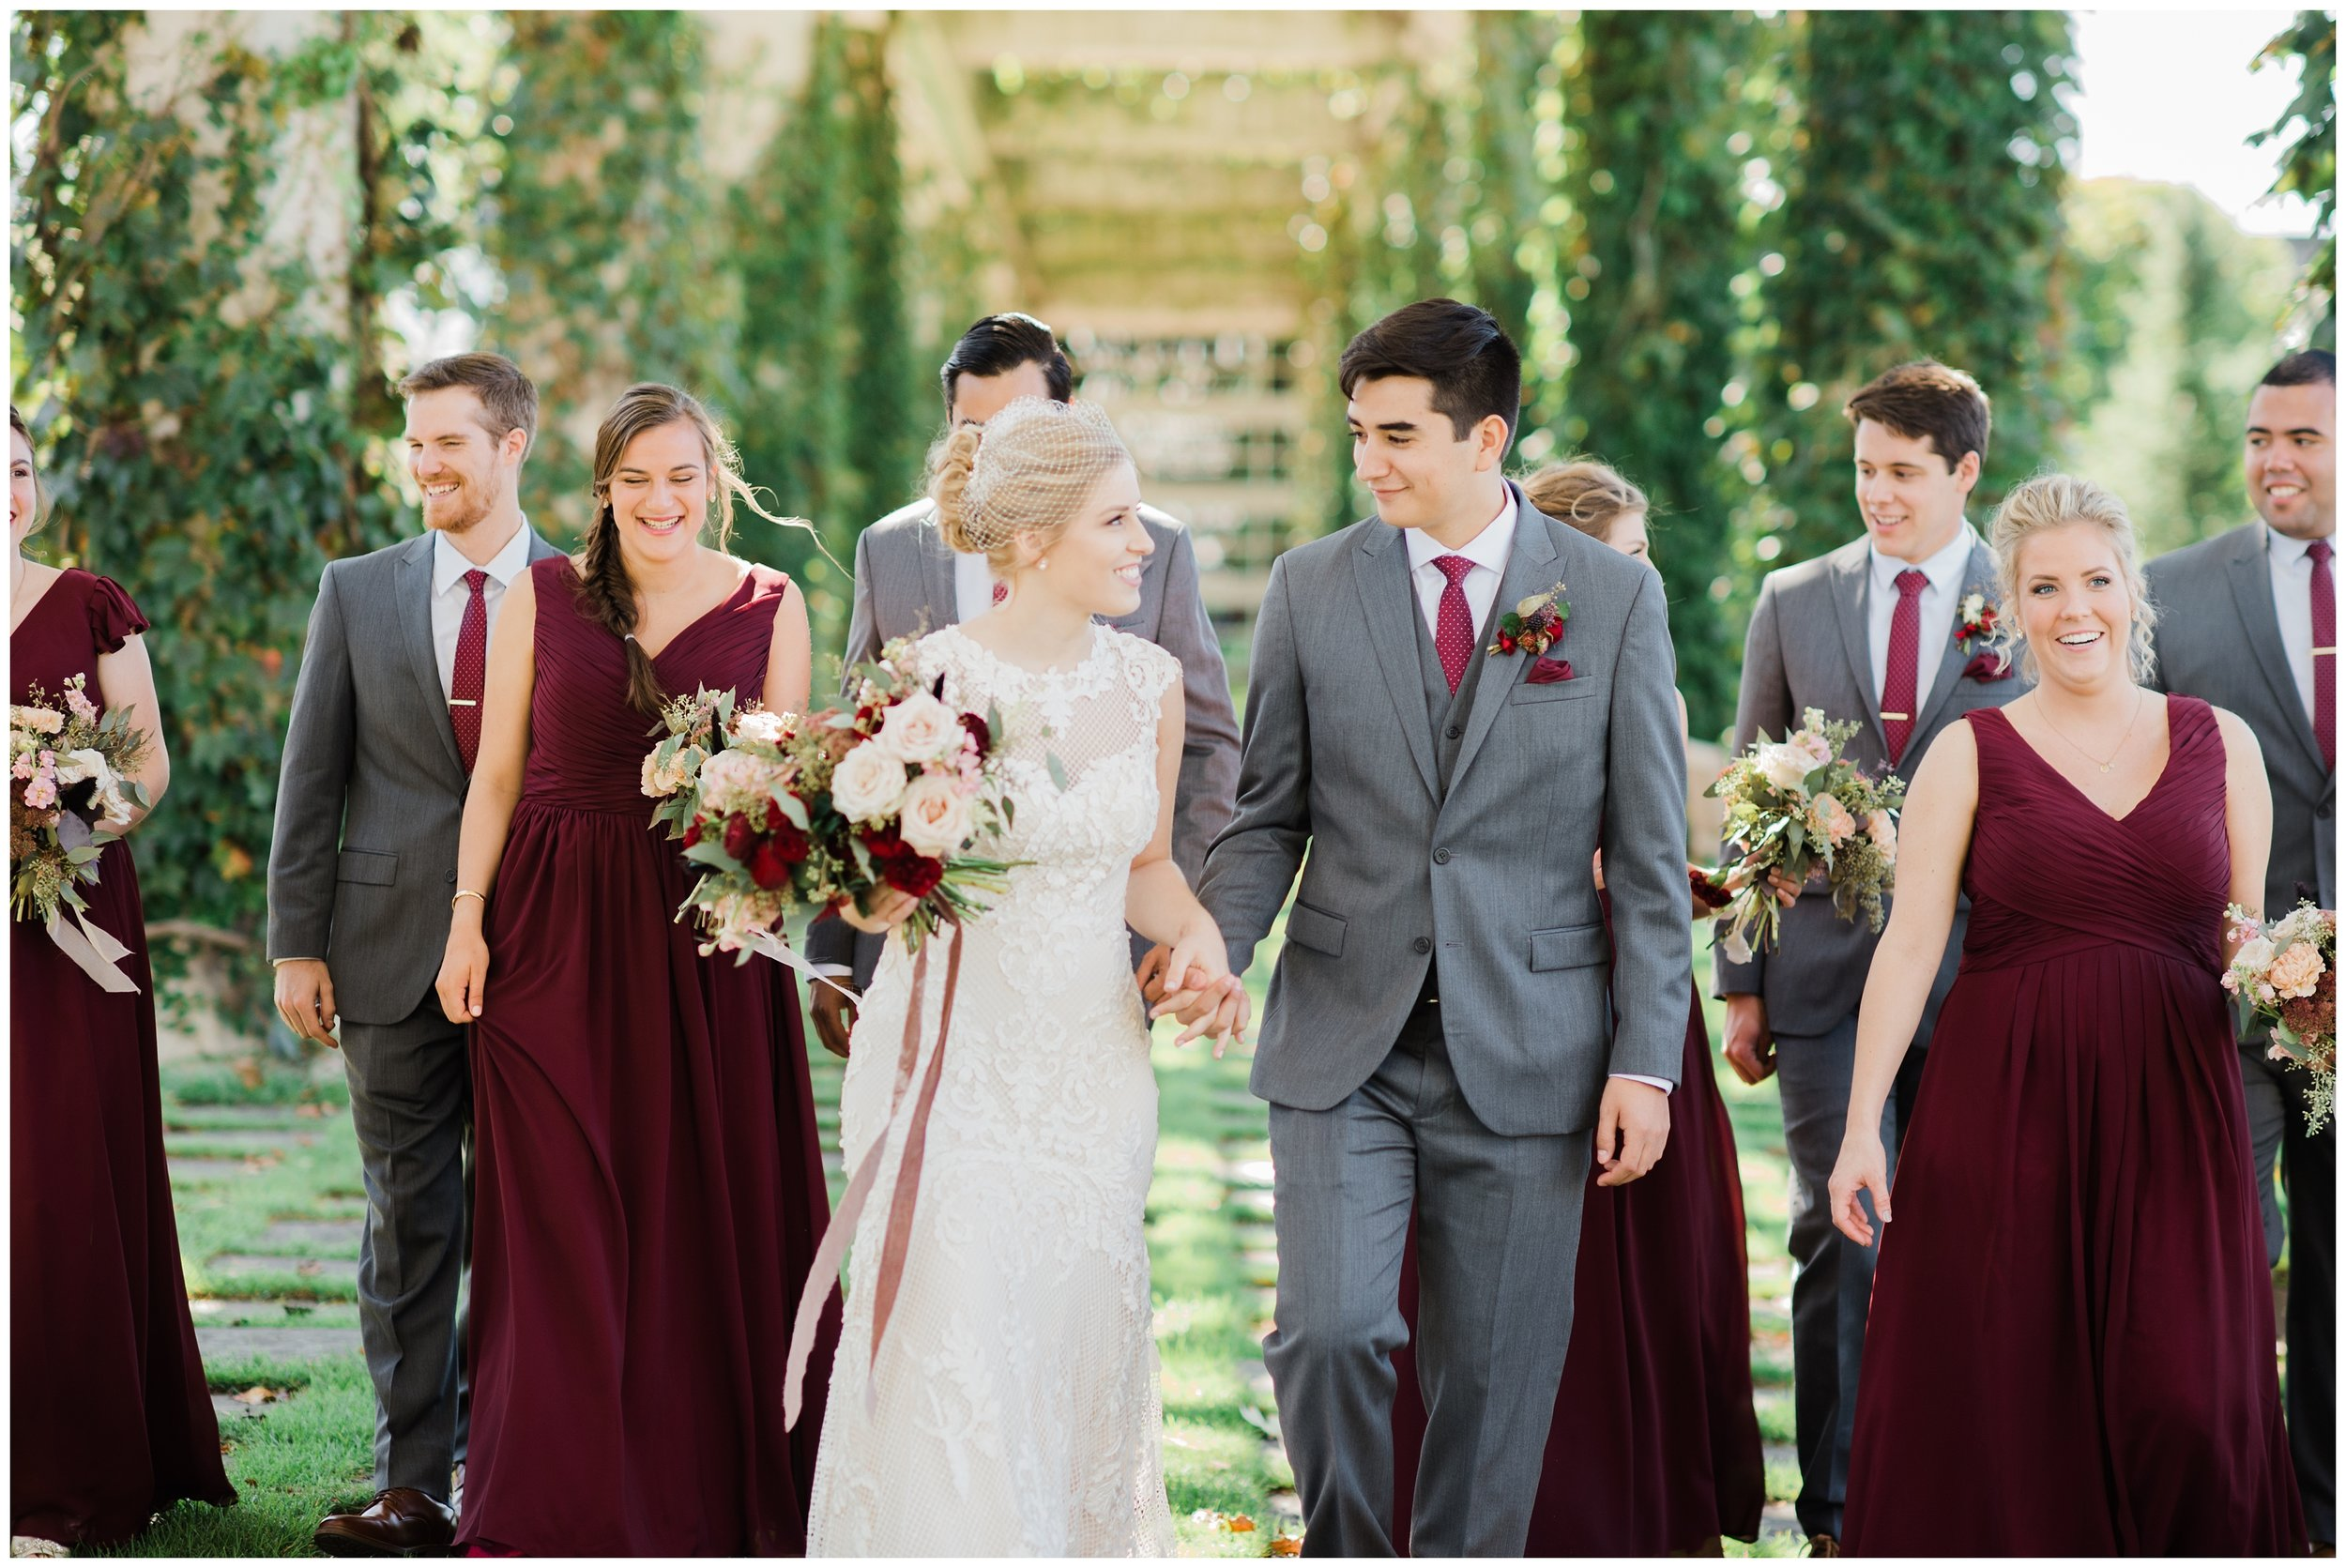 Rebecca_Shehorn_Photography_Indianapolis_Wedding_Photographer_7334.jpg